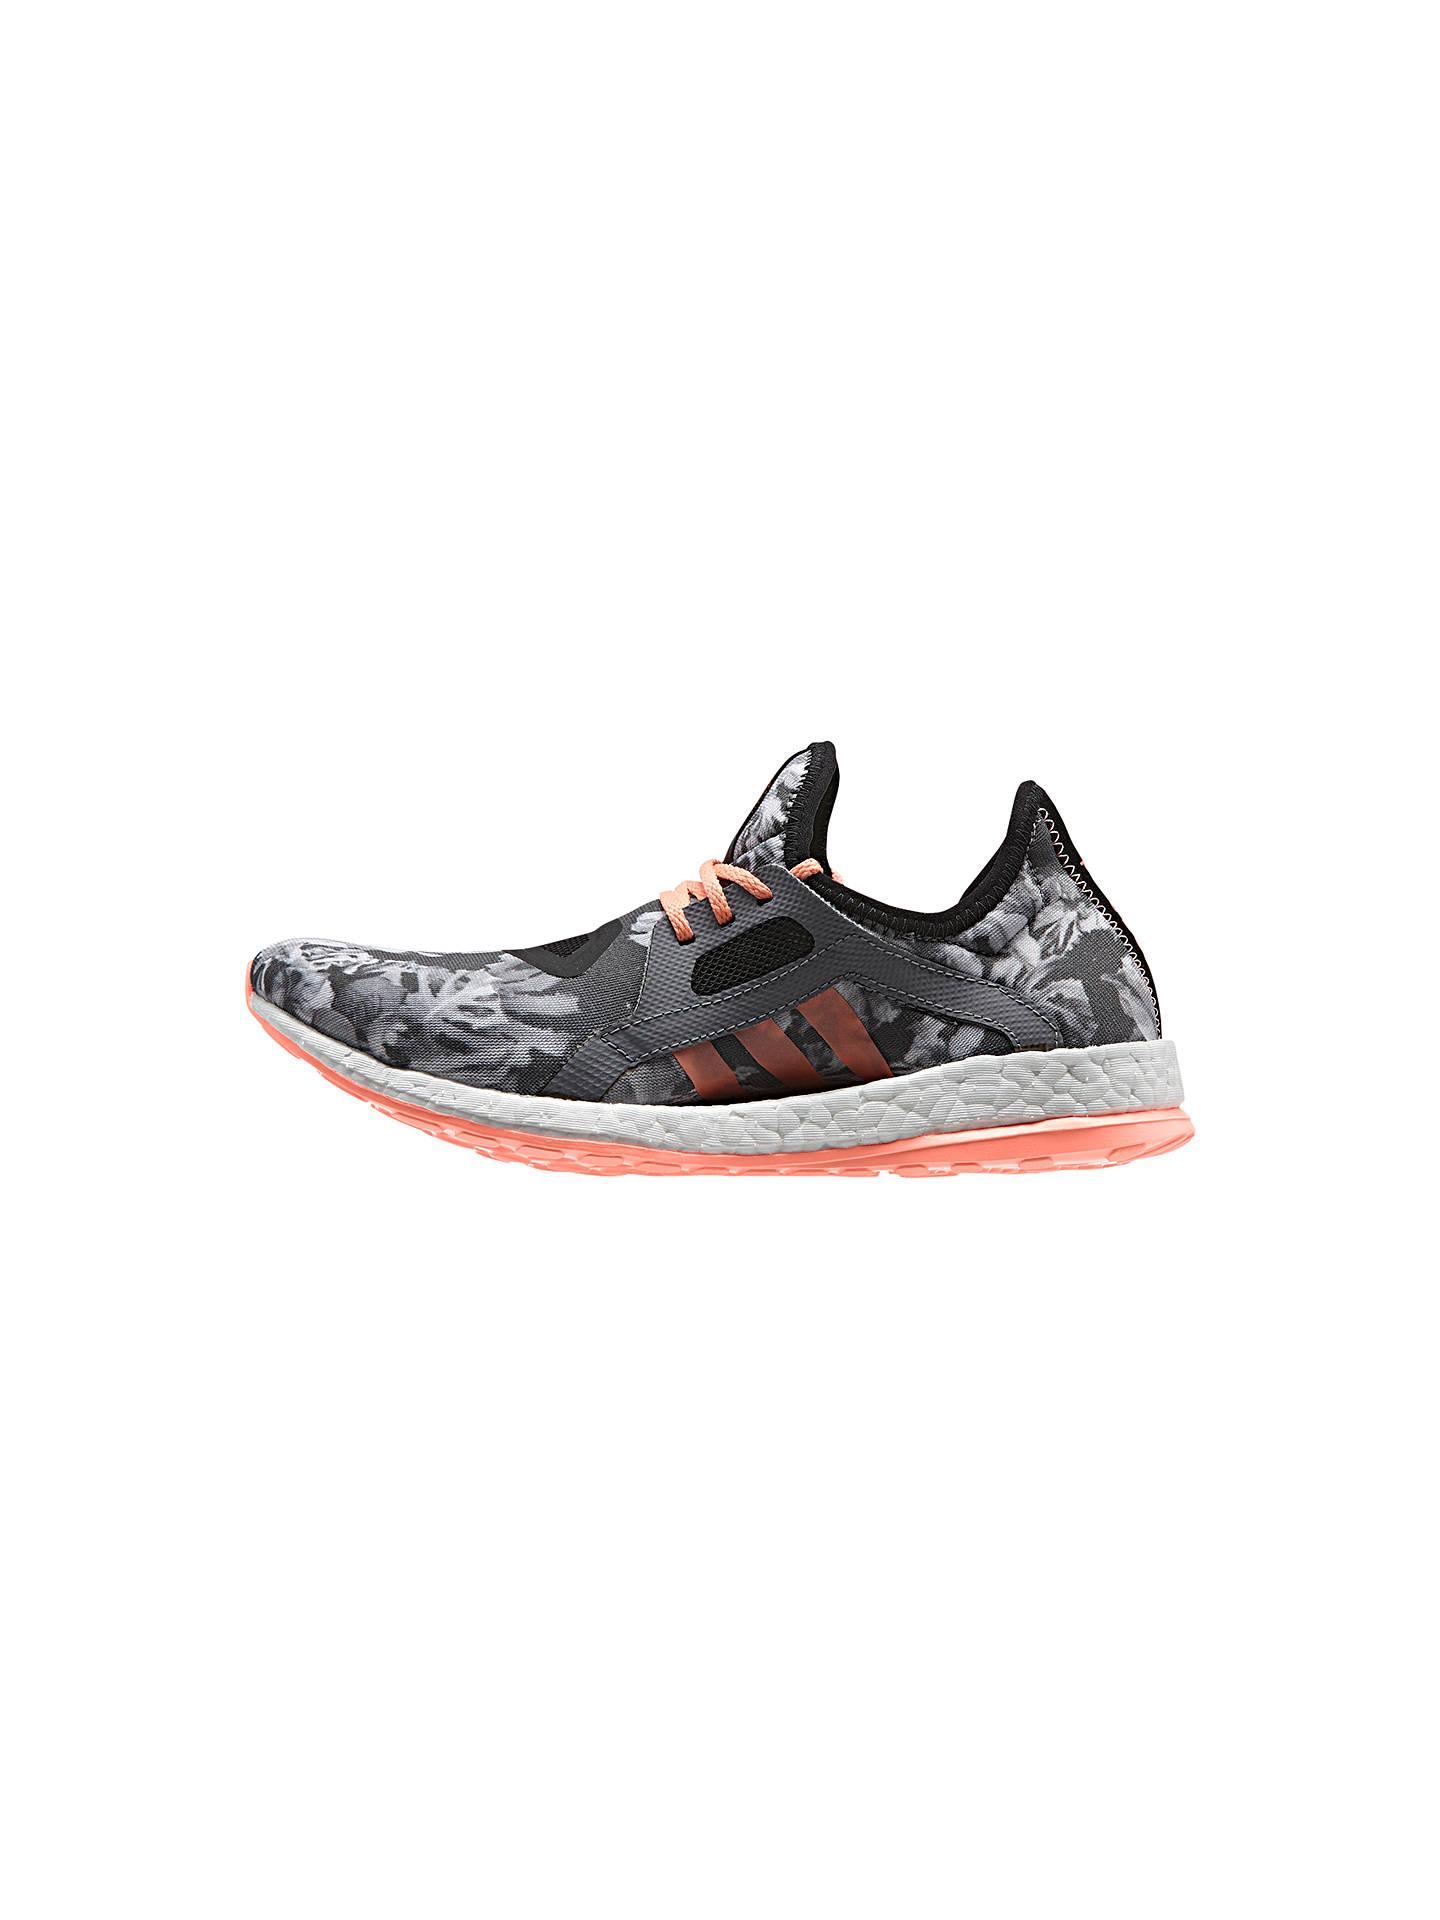 BuyAdidas Pureboost X Women s Running Shoes c259cb4e1